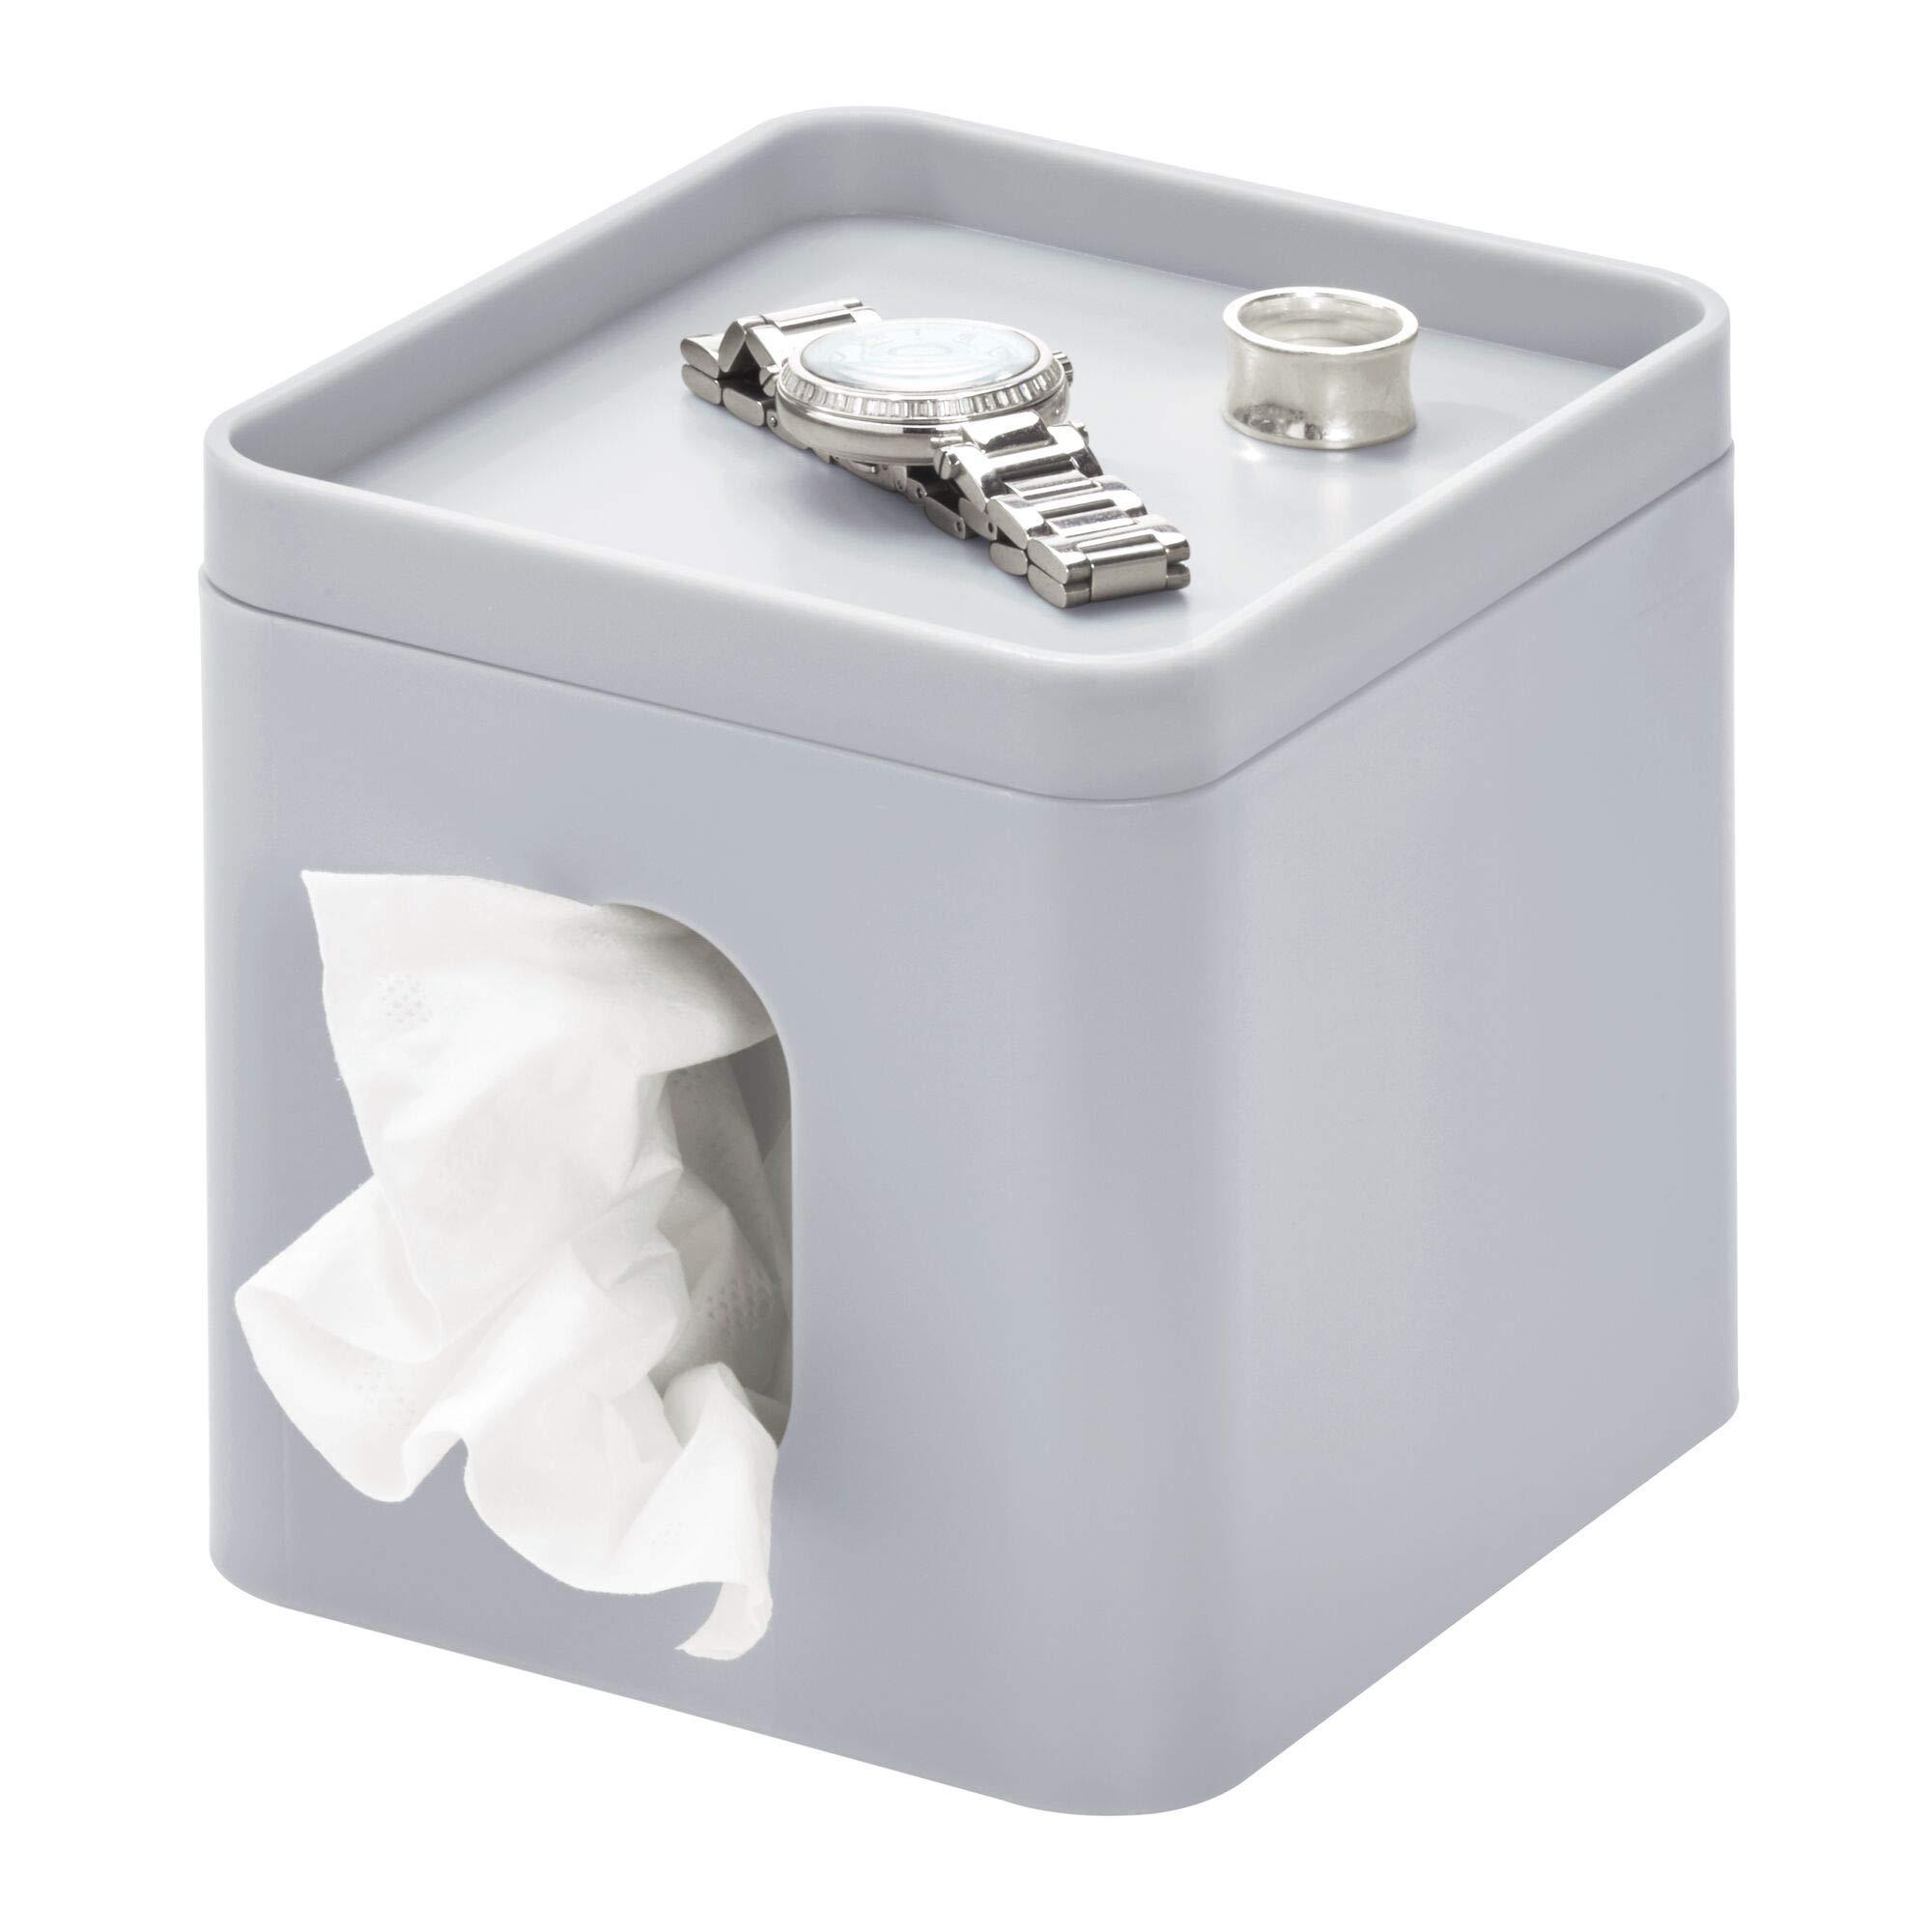 iDesign Cade Facial Tissue Cover, Boutique Box Bathroom Holder for Vanity, Countertops, Desk, Office, Dorm, 15.5 cm x 13.1 cm x 13.7 cm, Matte Gray